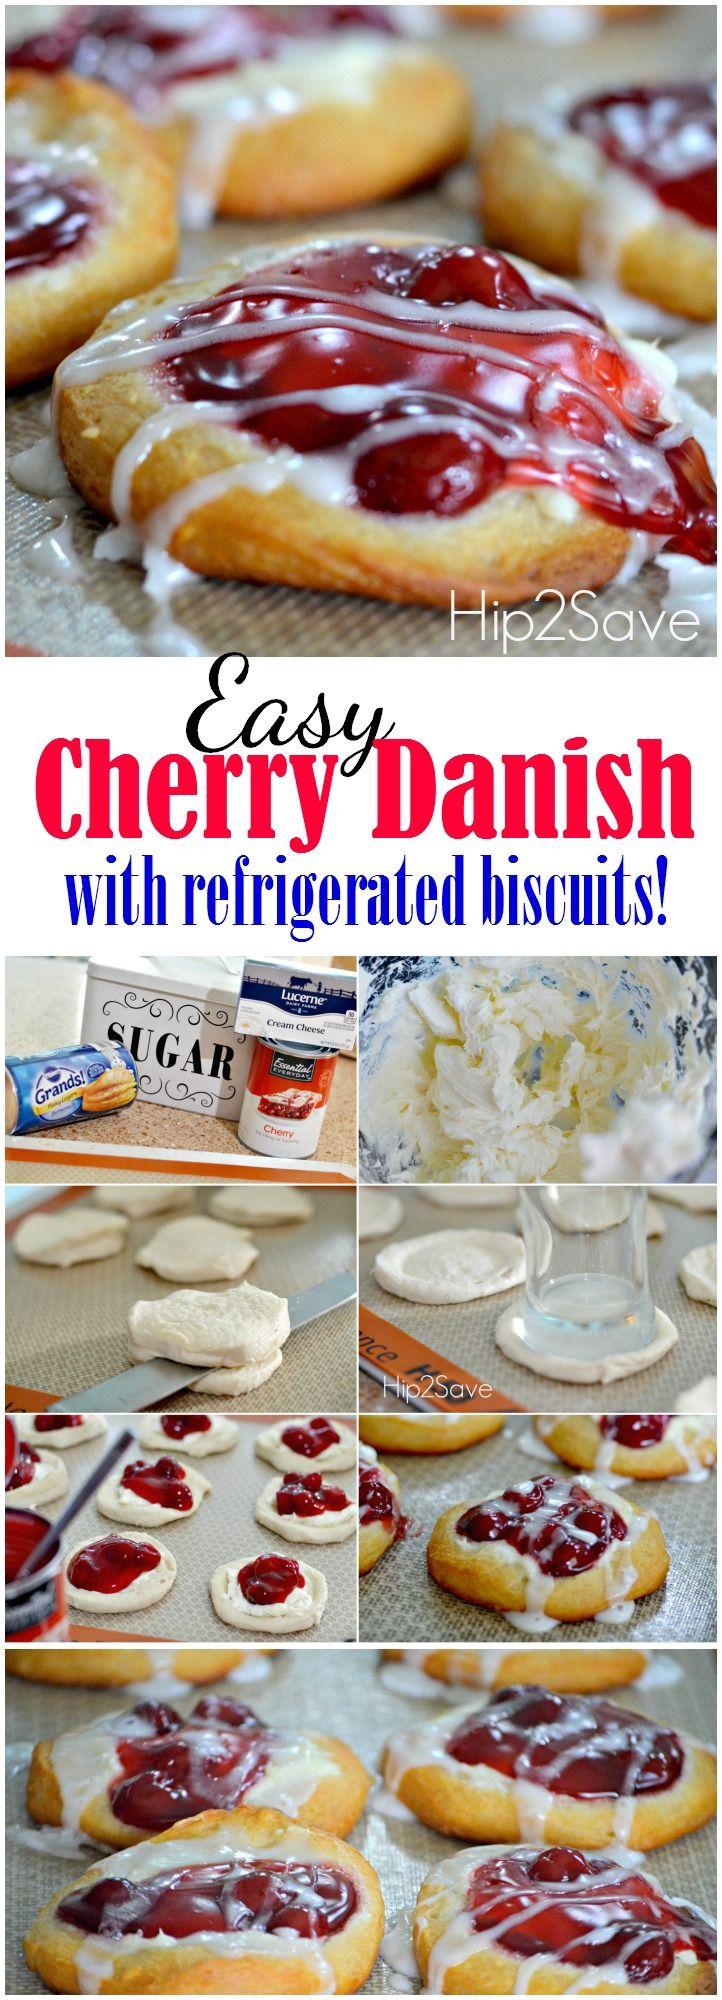 how to make danish sweet rolls